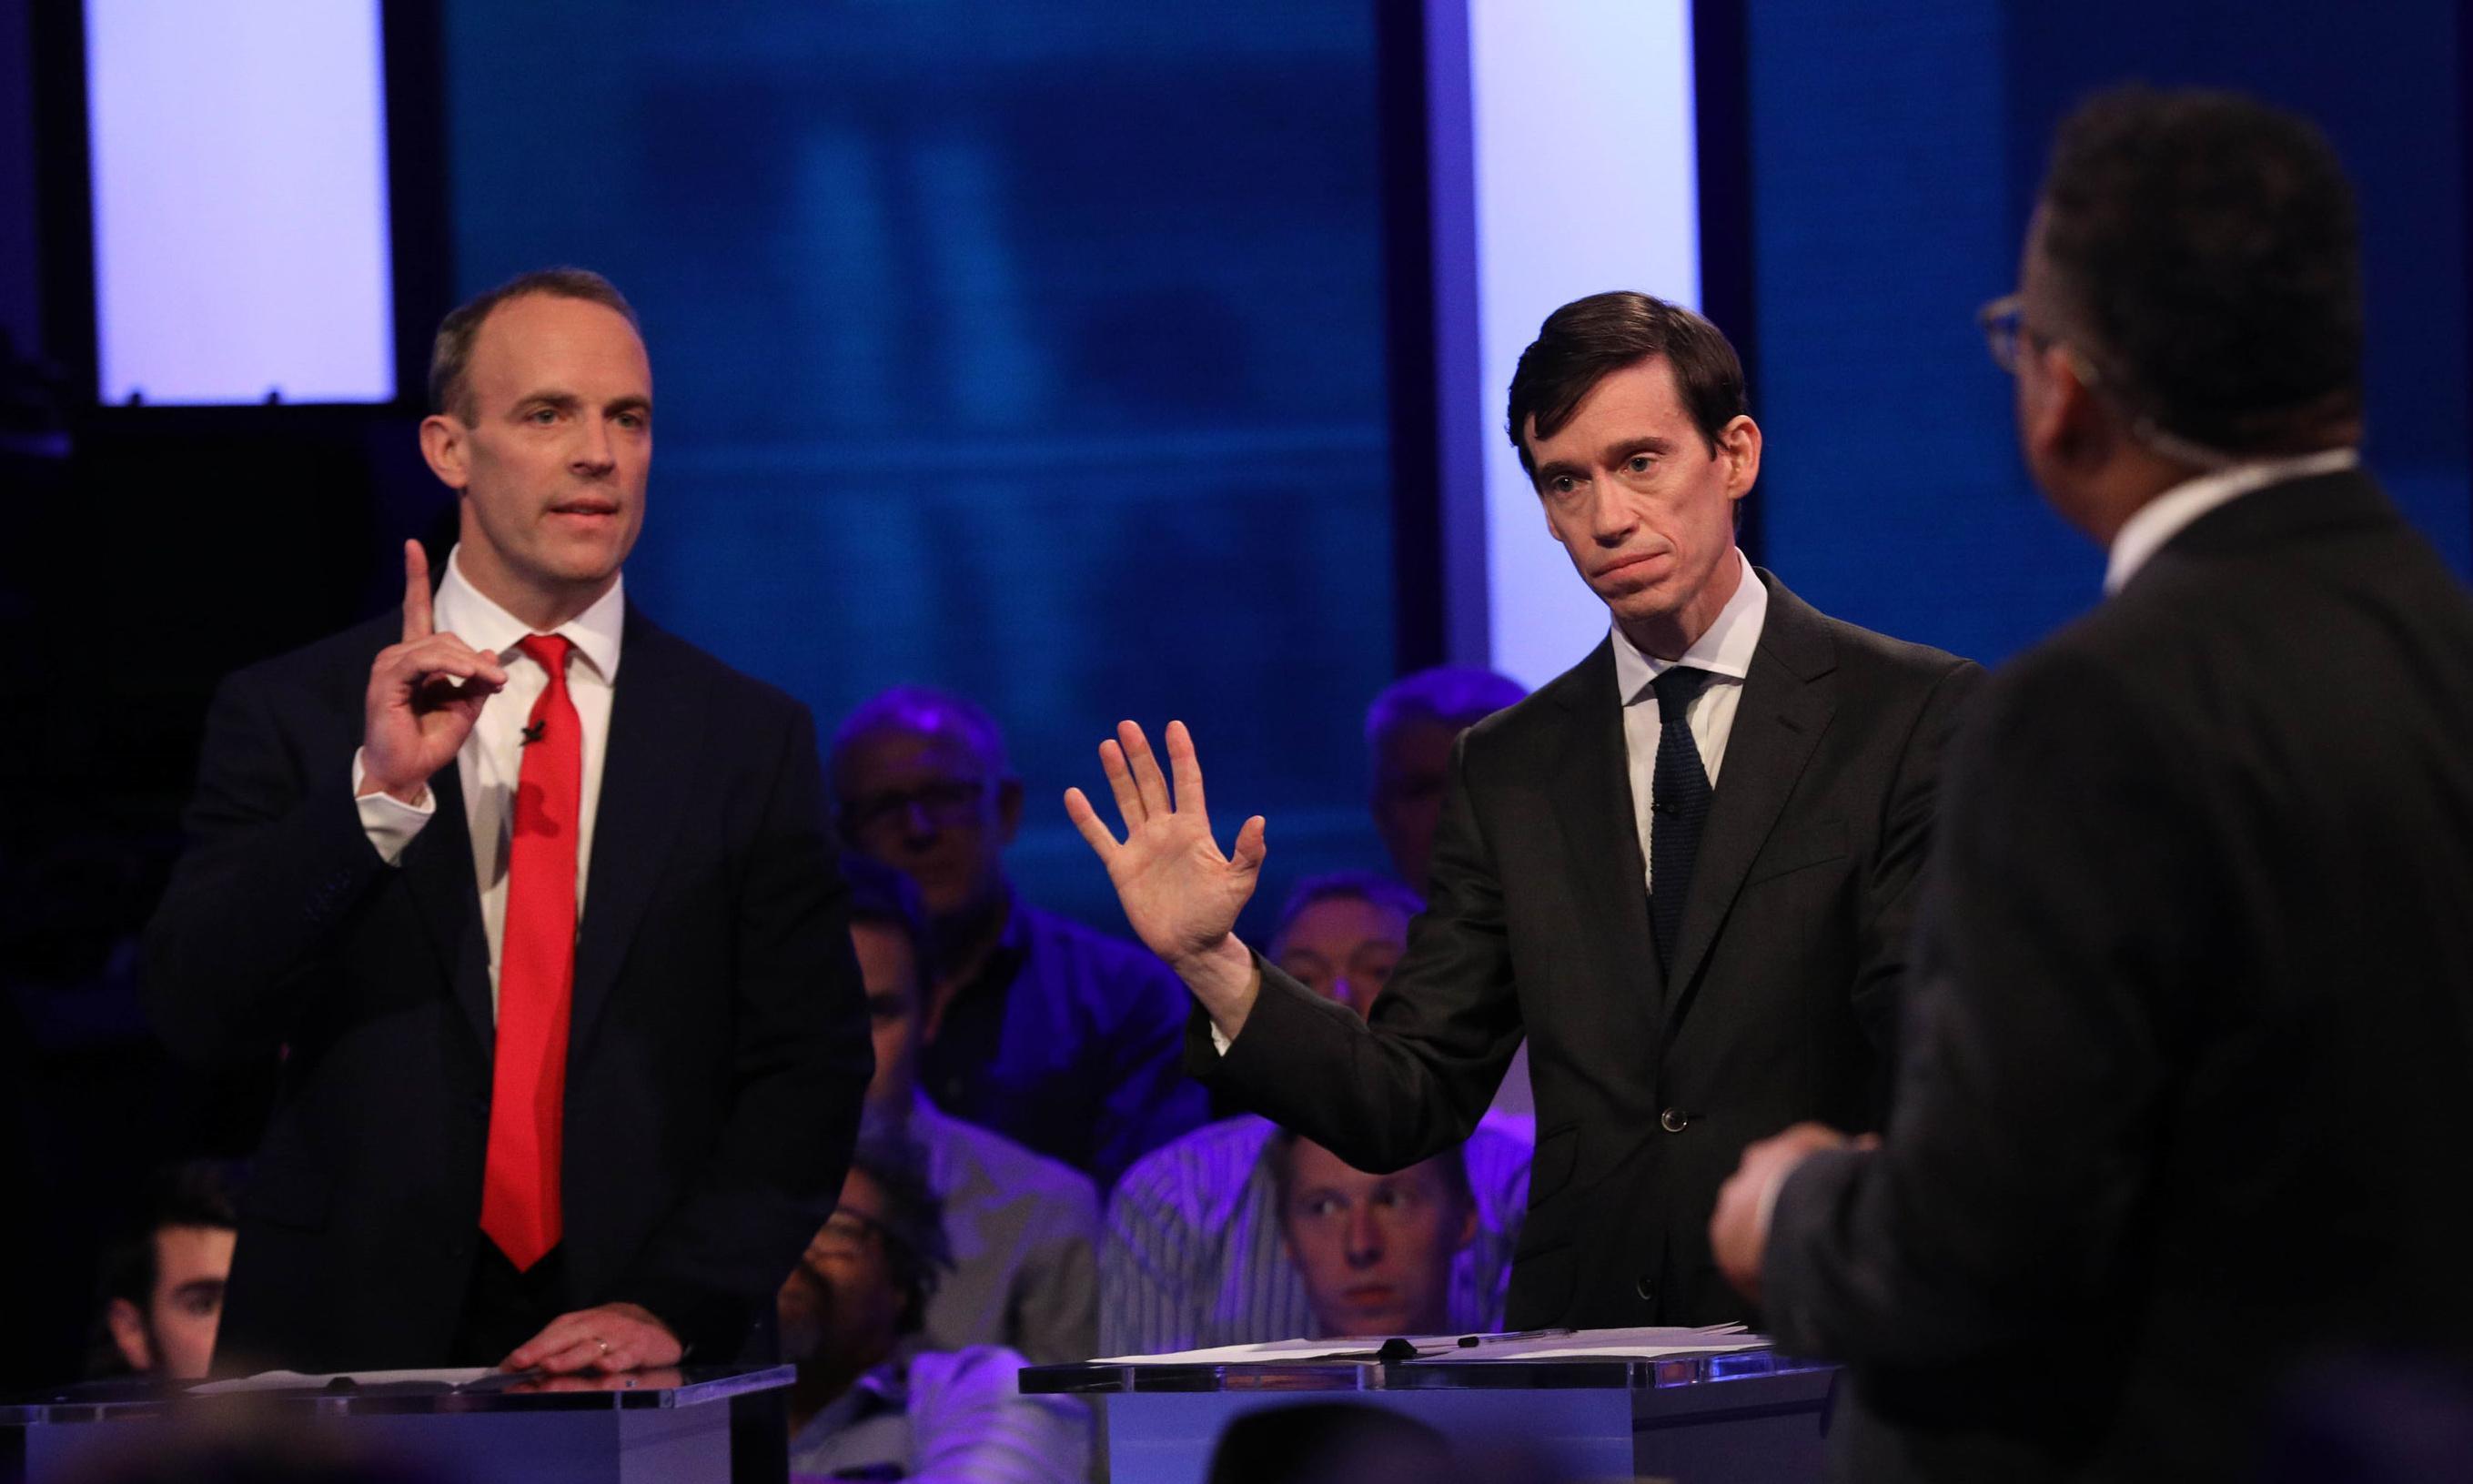 Silence is golden as Boris's lectern wins Tory televised debate